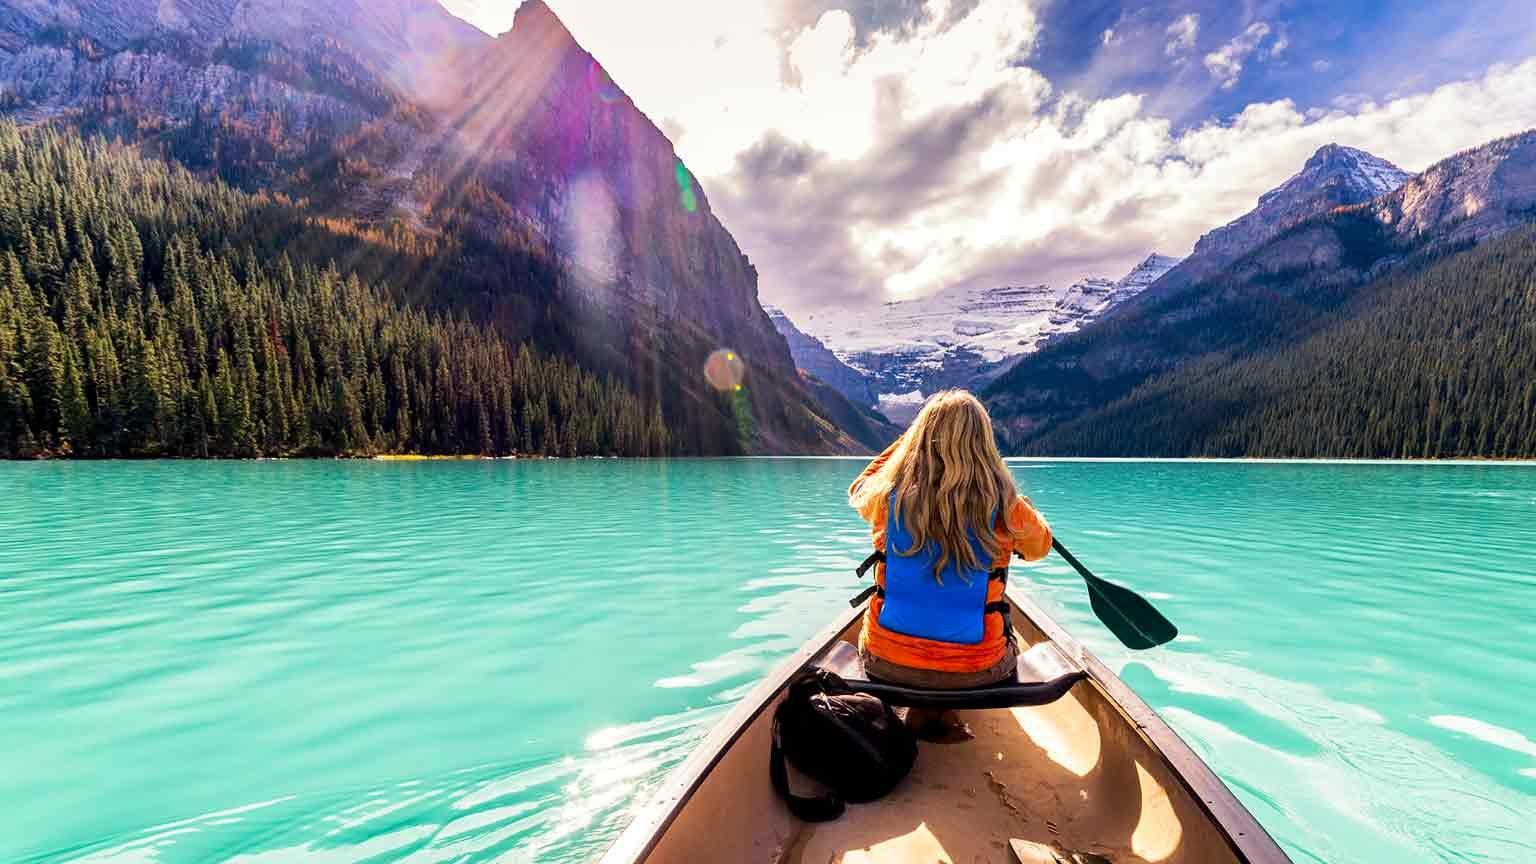 Girl in a canoe at Lake Louise, Alberta, Canada